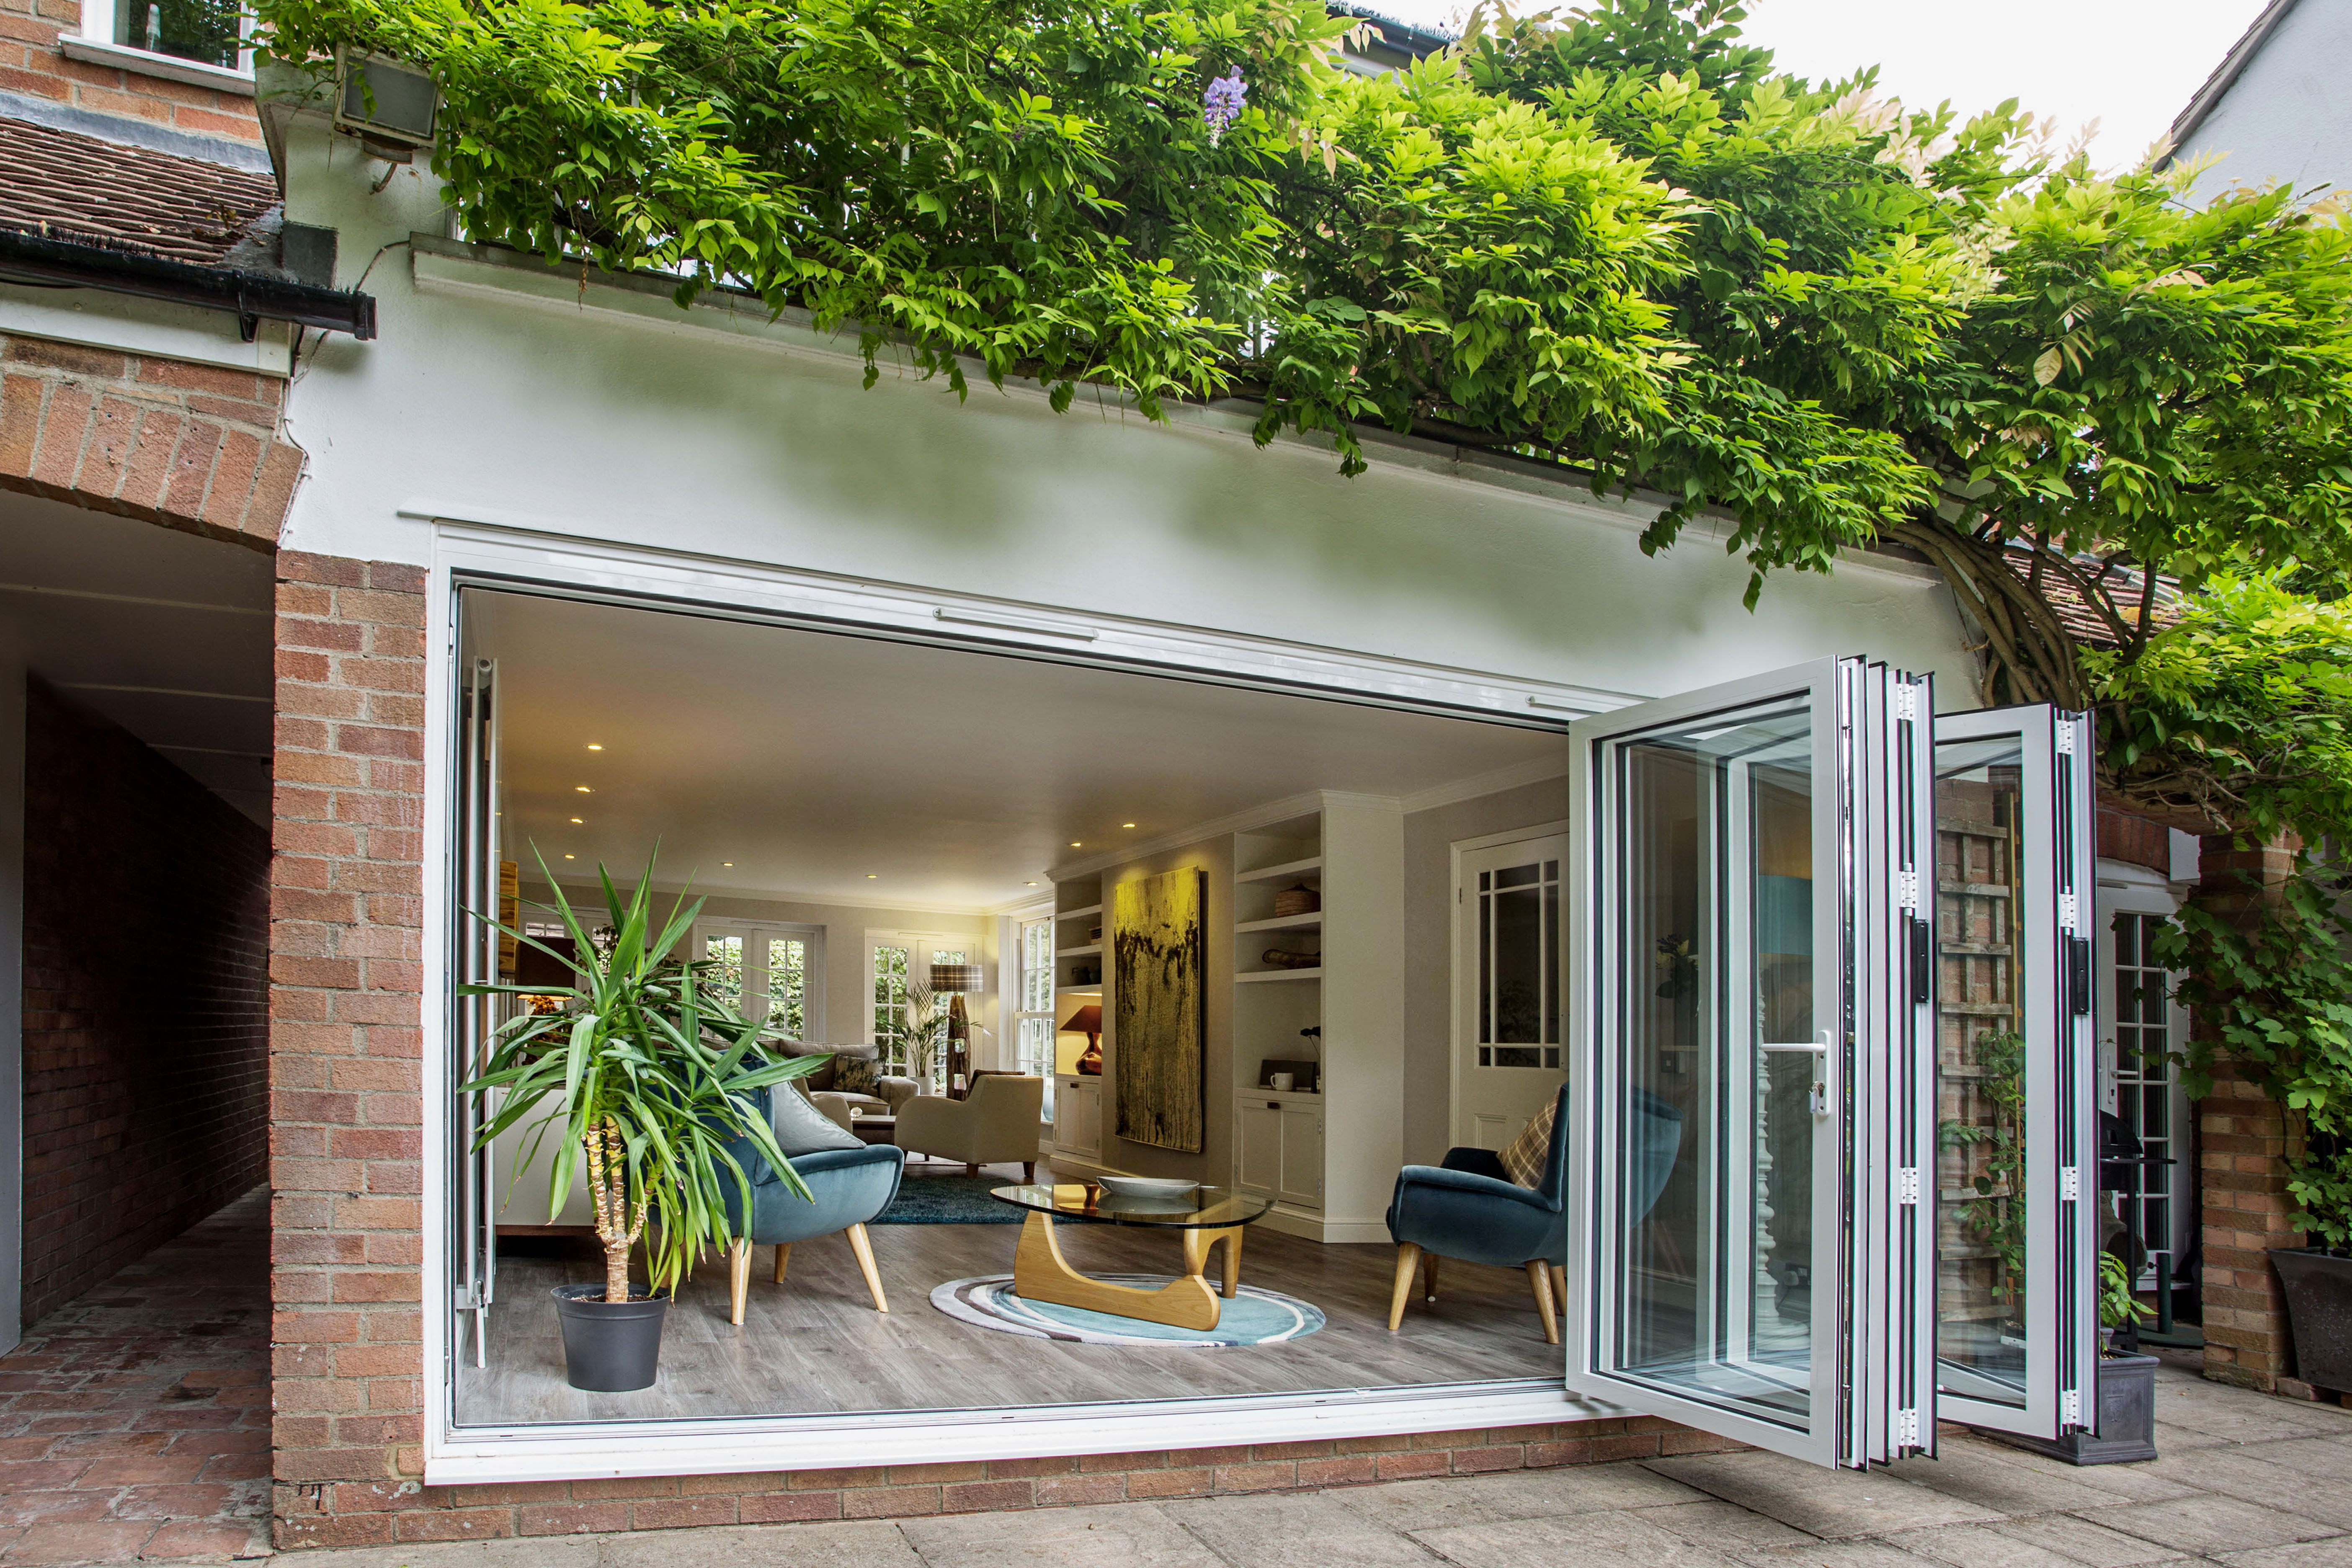 building renovation, building extension, interior designer oxfordshire, interior design berkshire, interior designer berkshire, home decor, interior styling,